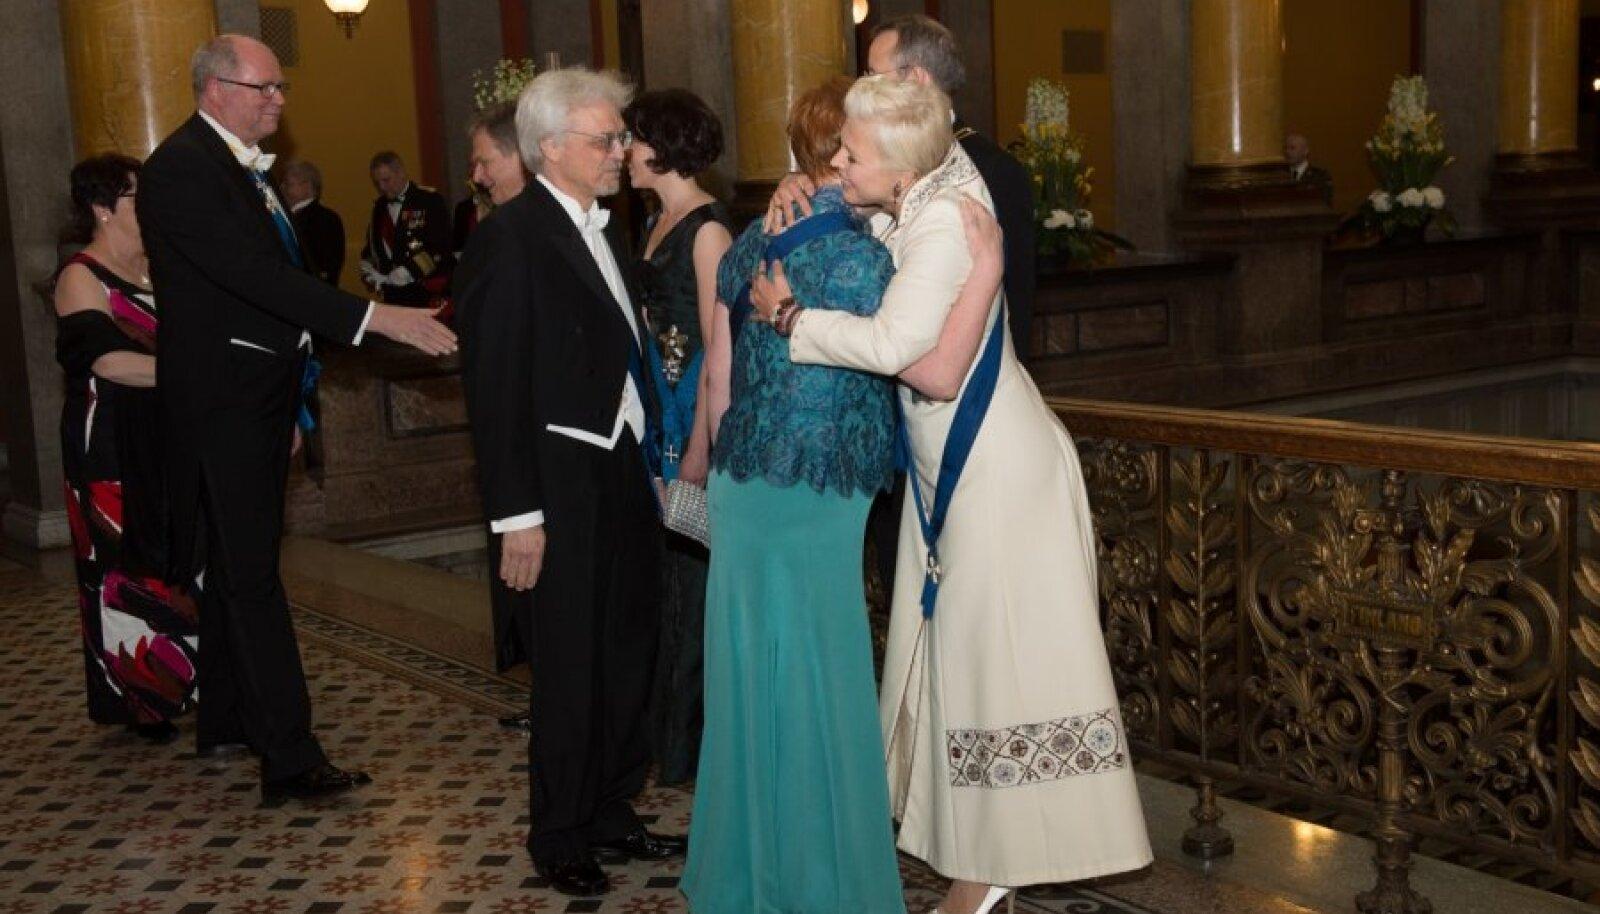 Kätlemine ja riigiõhtusöök Sauli Niinistö kutsel